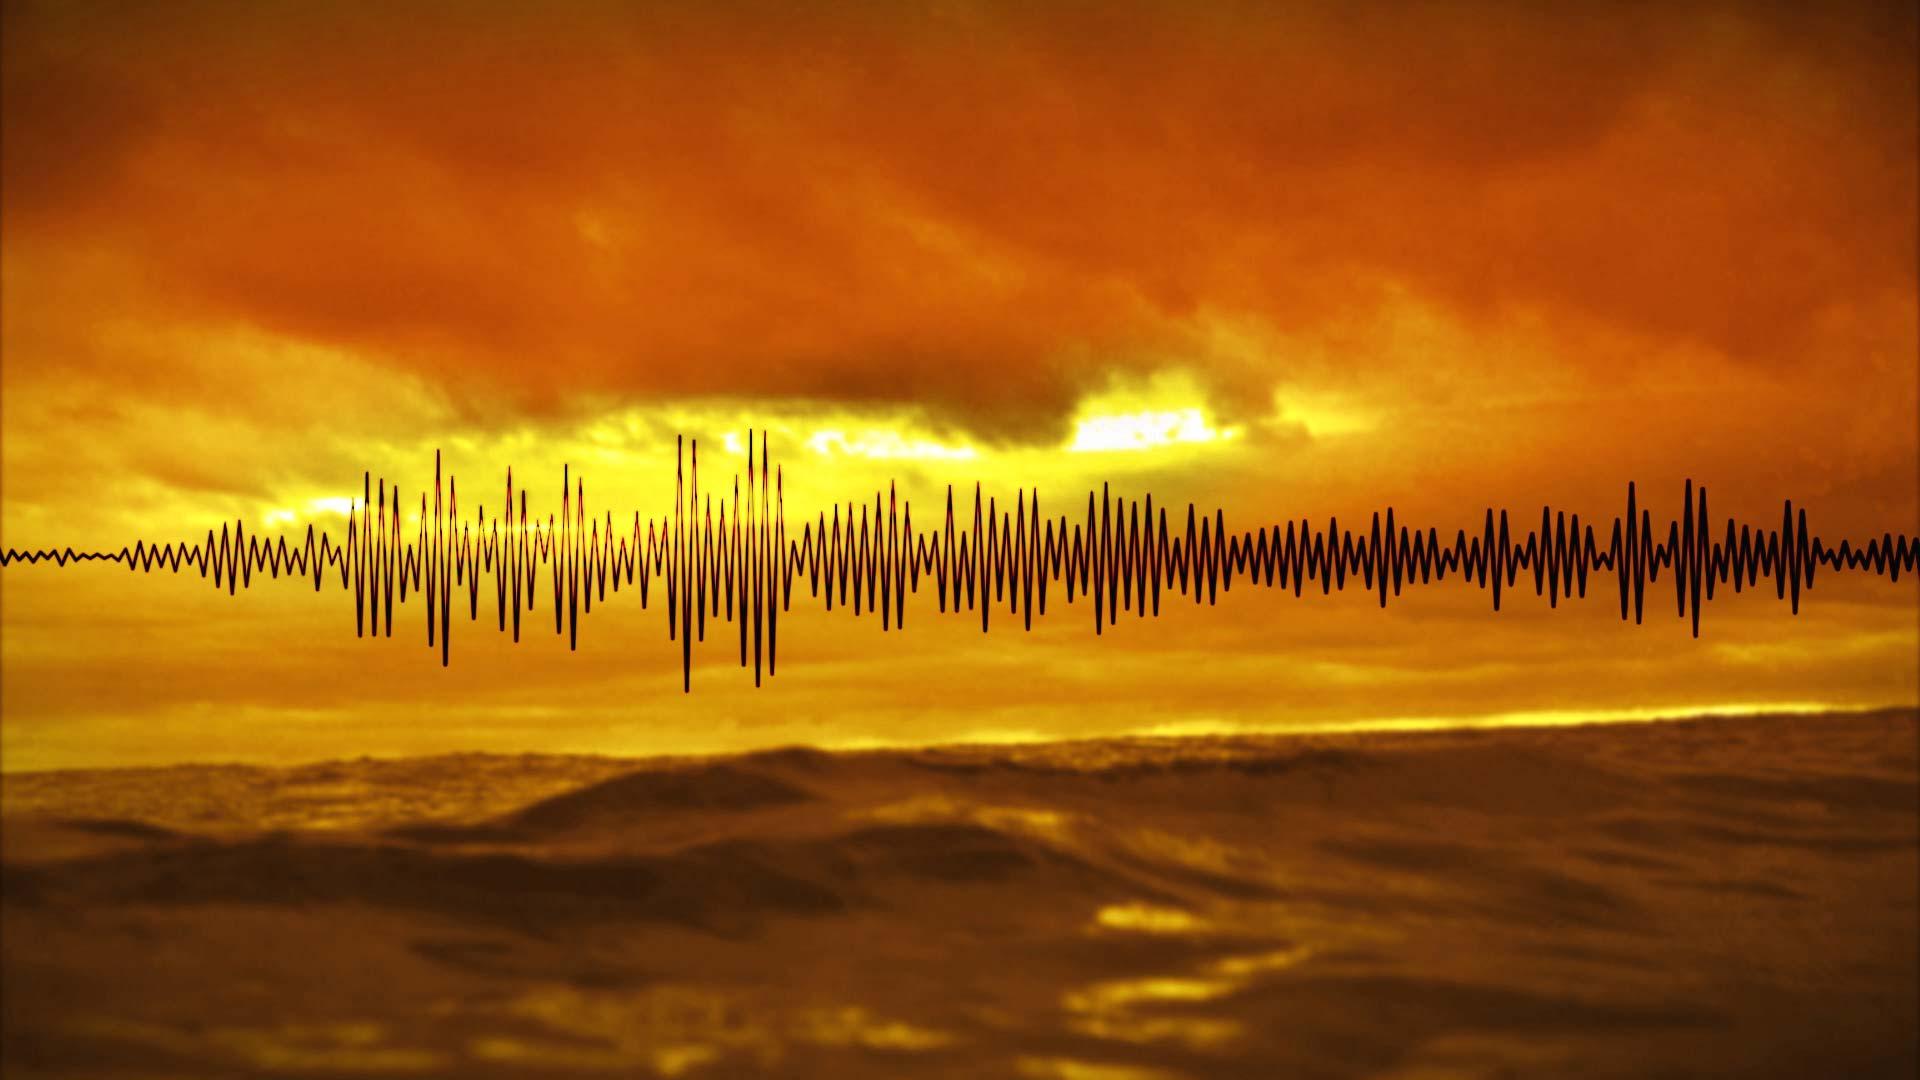 video extra - fear the walking dead - radio waves: fear the walking